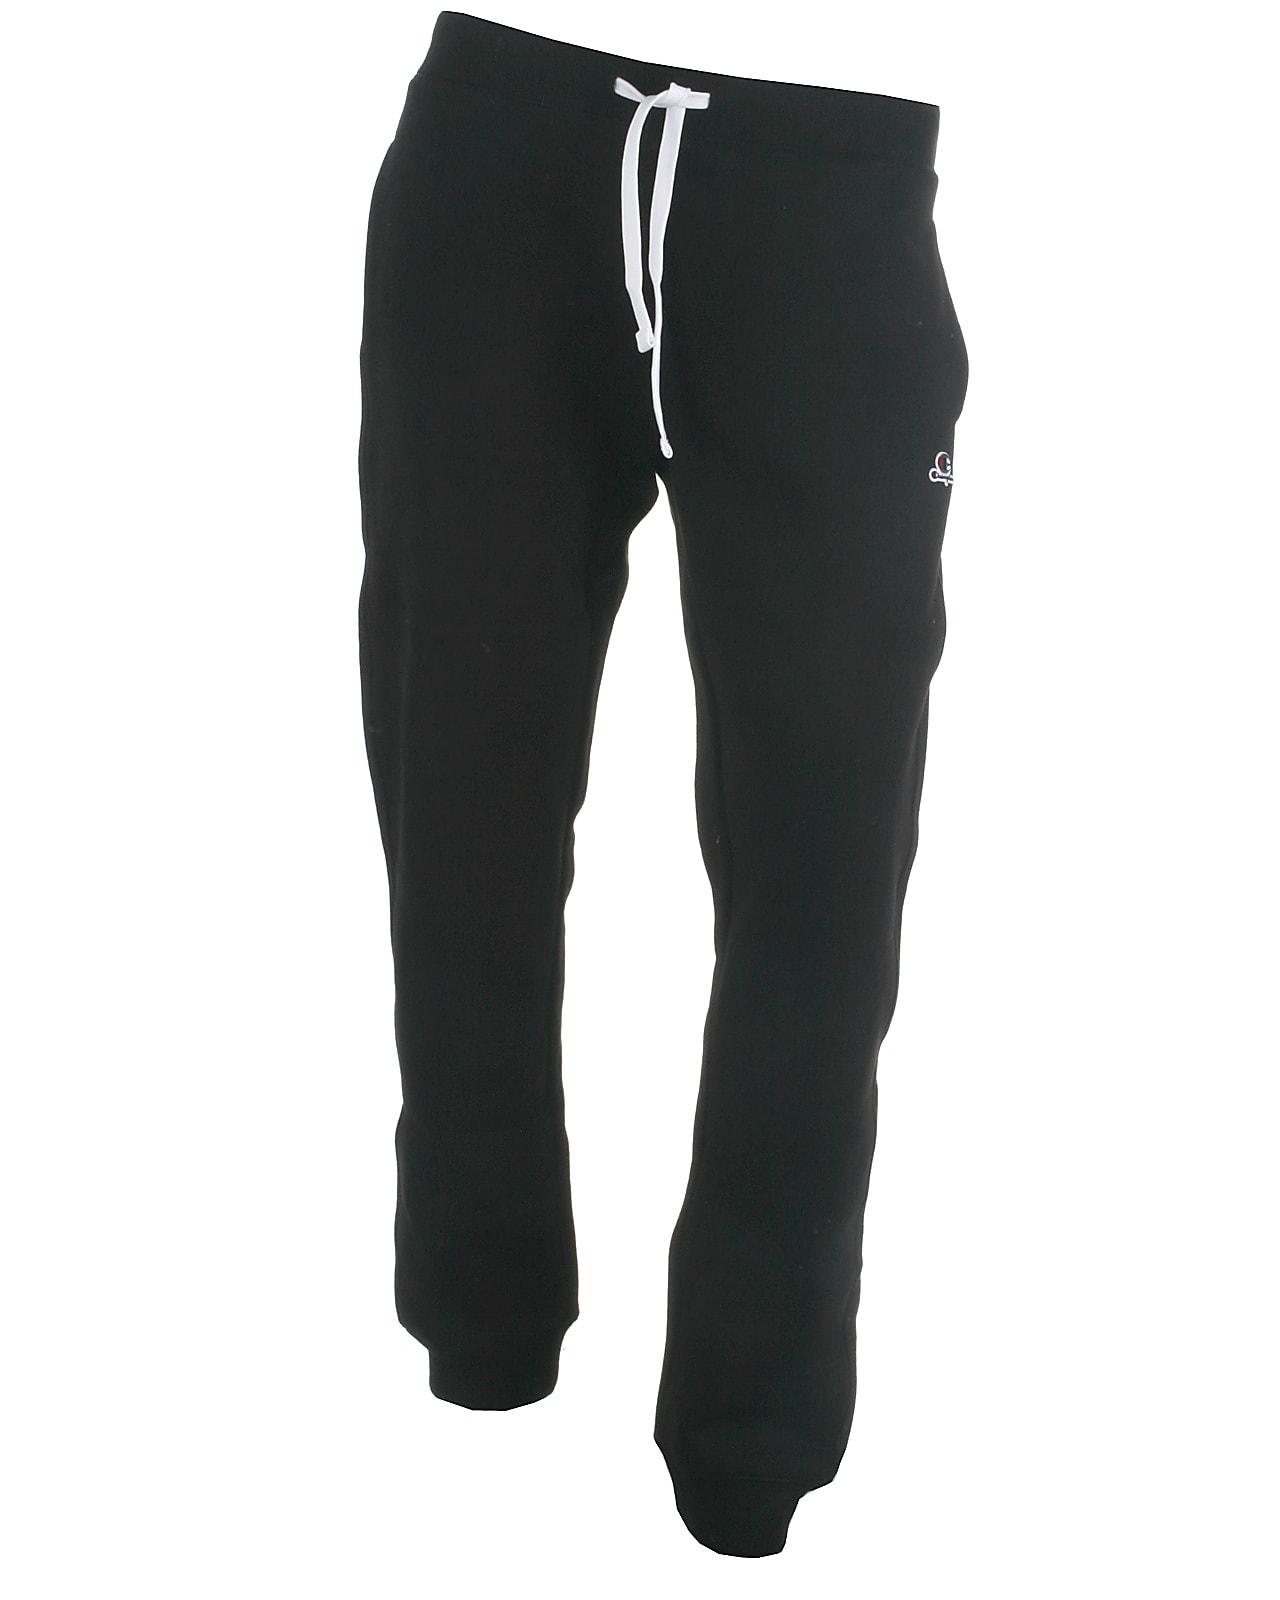 Image of Champion sweat pants, black